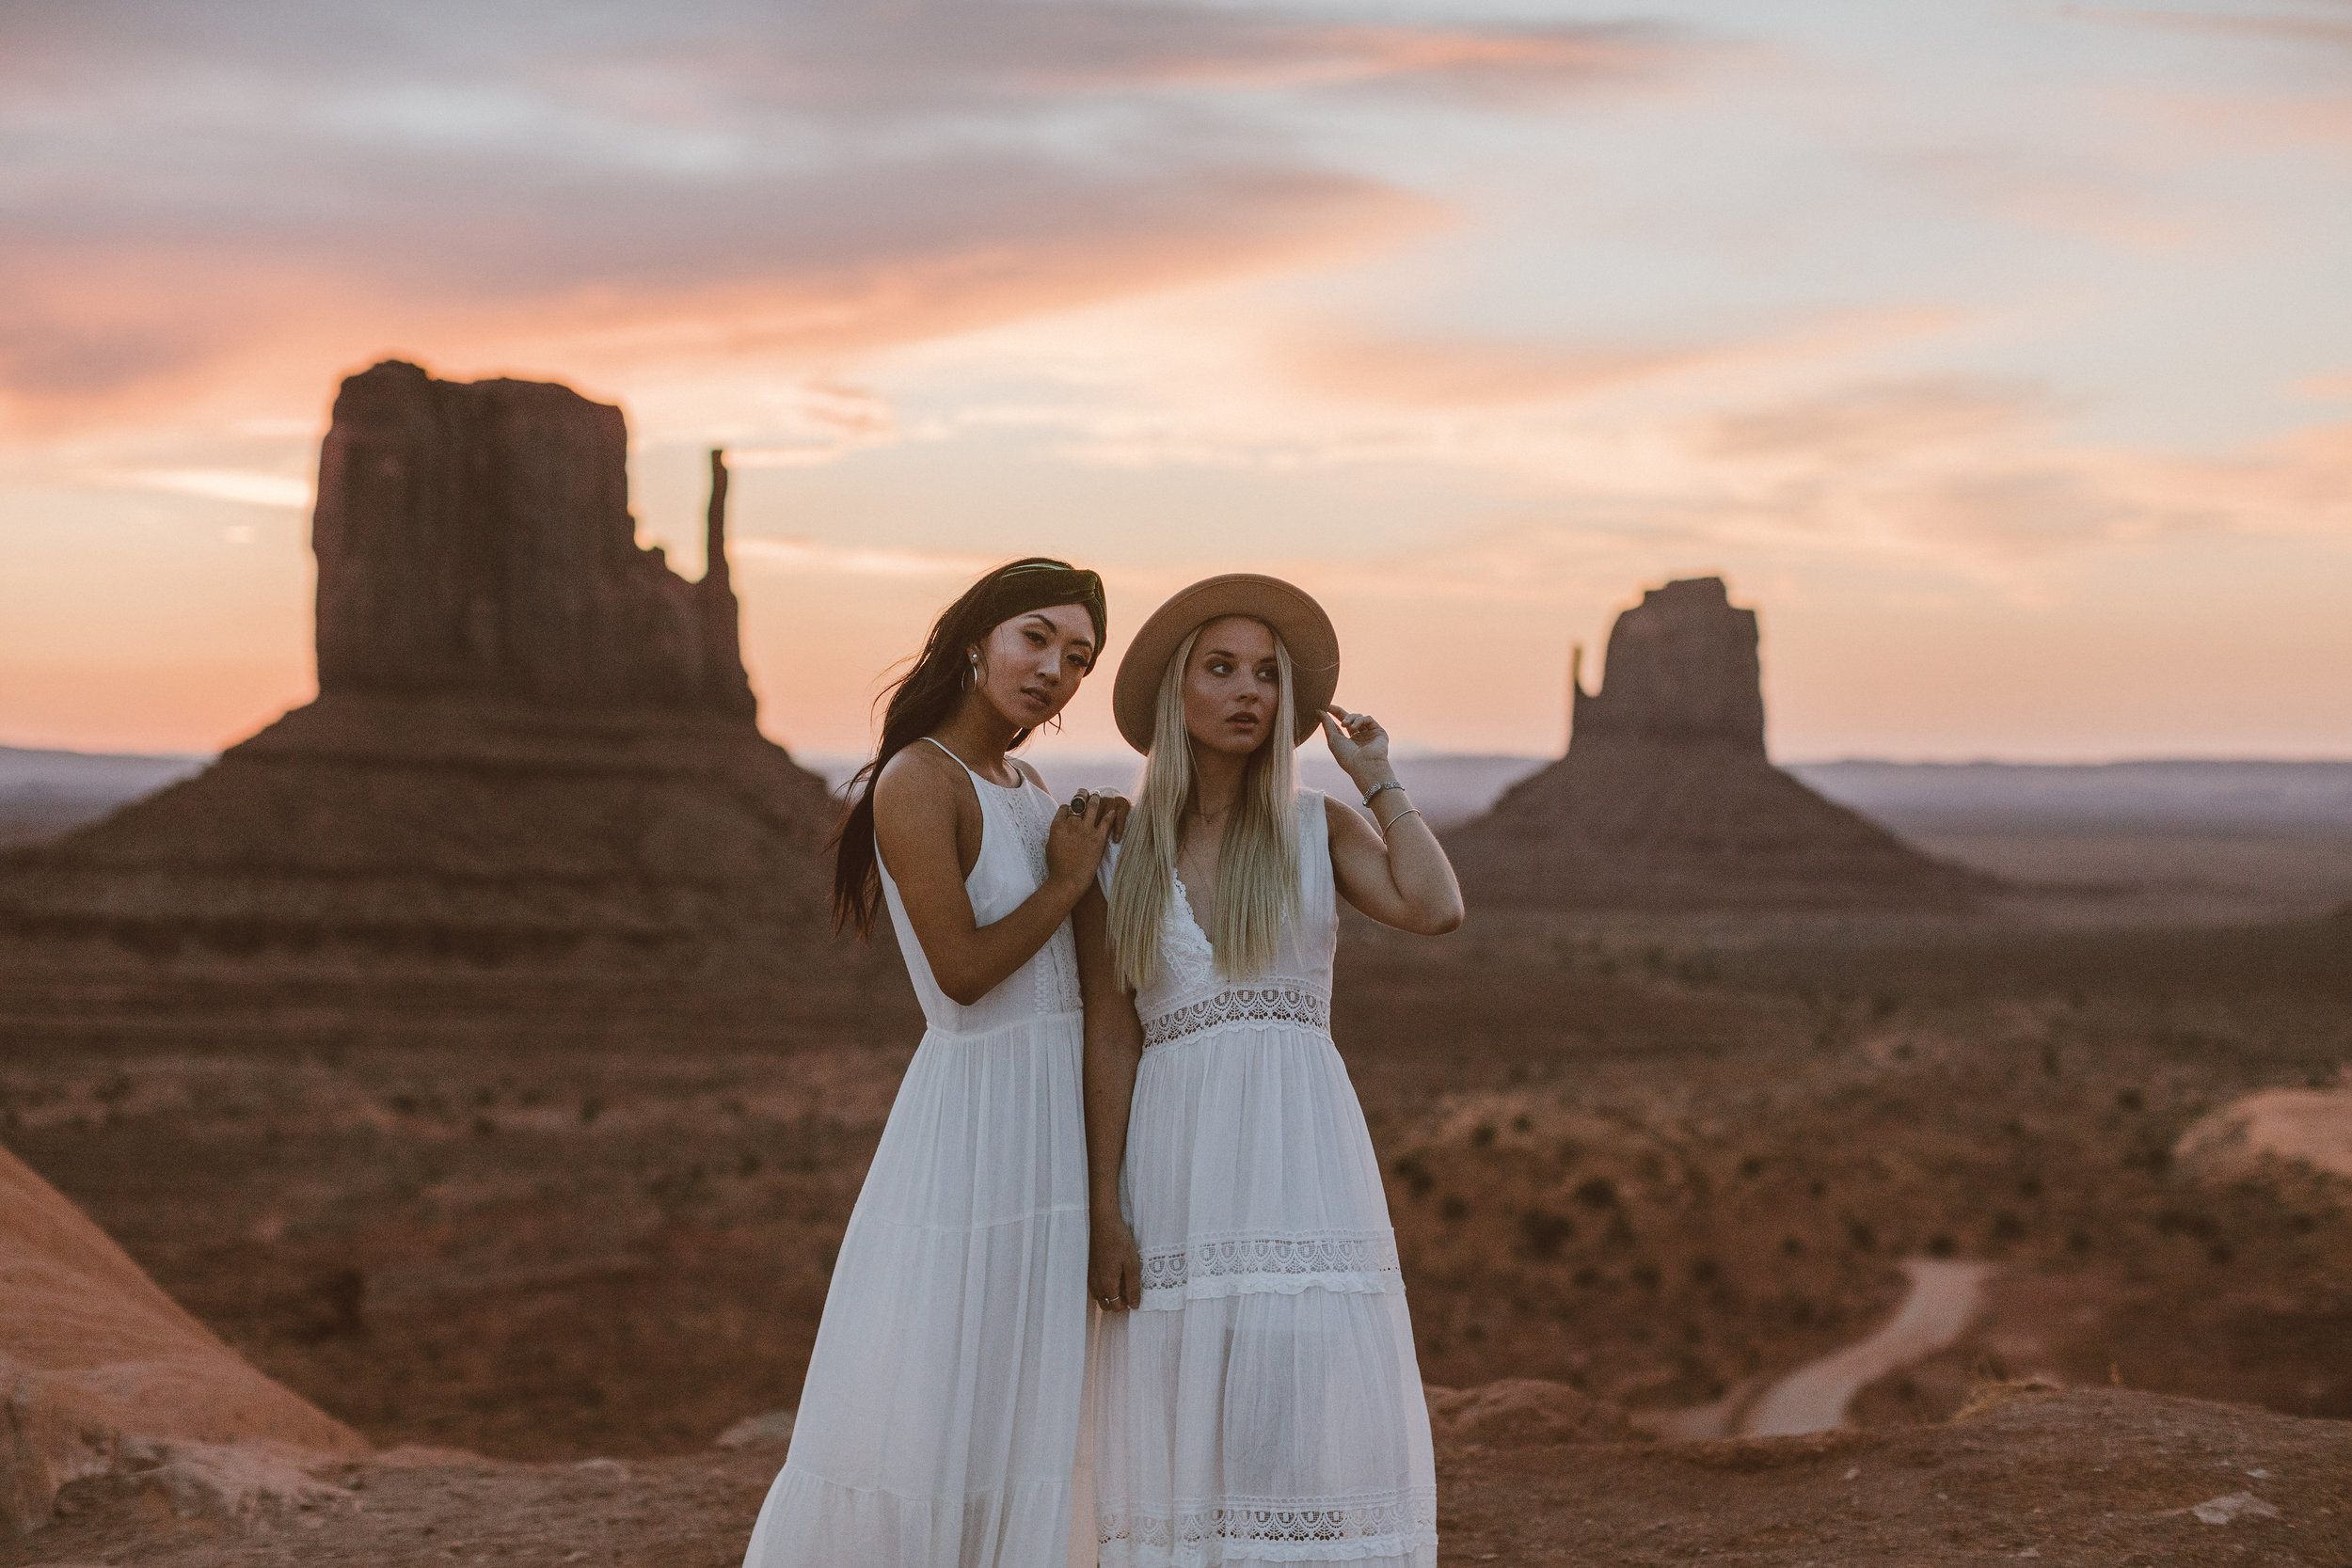 Monument Valley  Photography: Ashley Jensen  Models: Jiajing Yi, Marissa Stagg  Hair, Makeup & Wardrobe: Abigail Hill